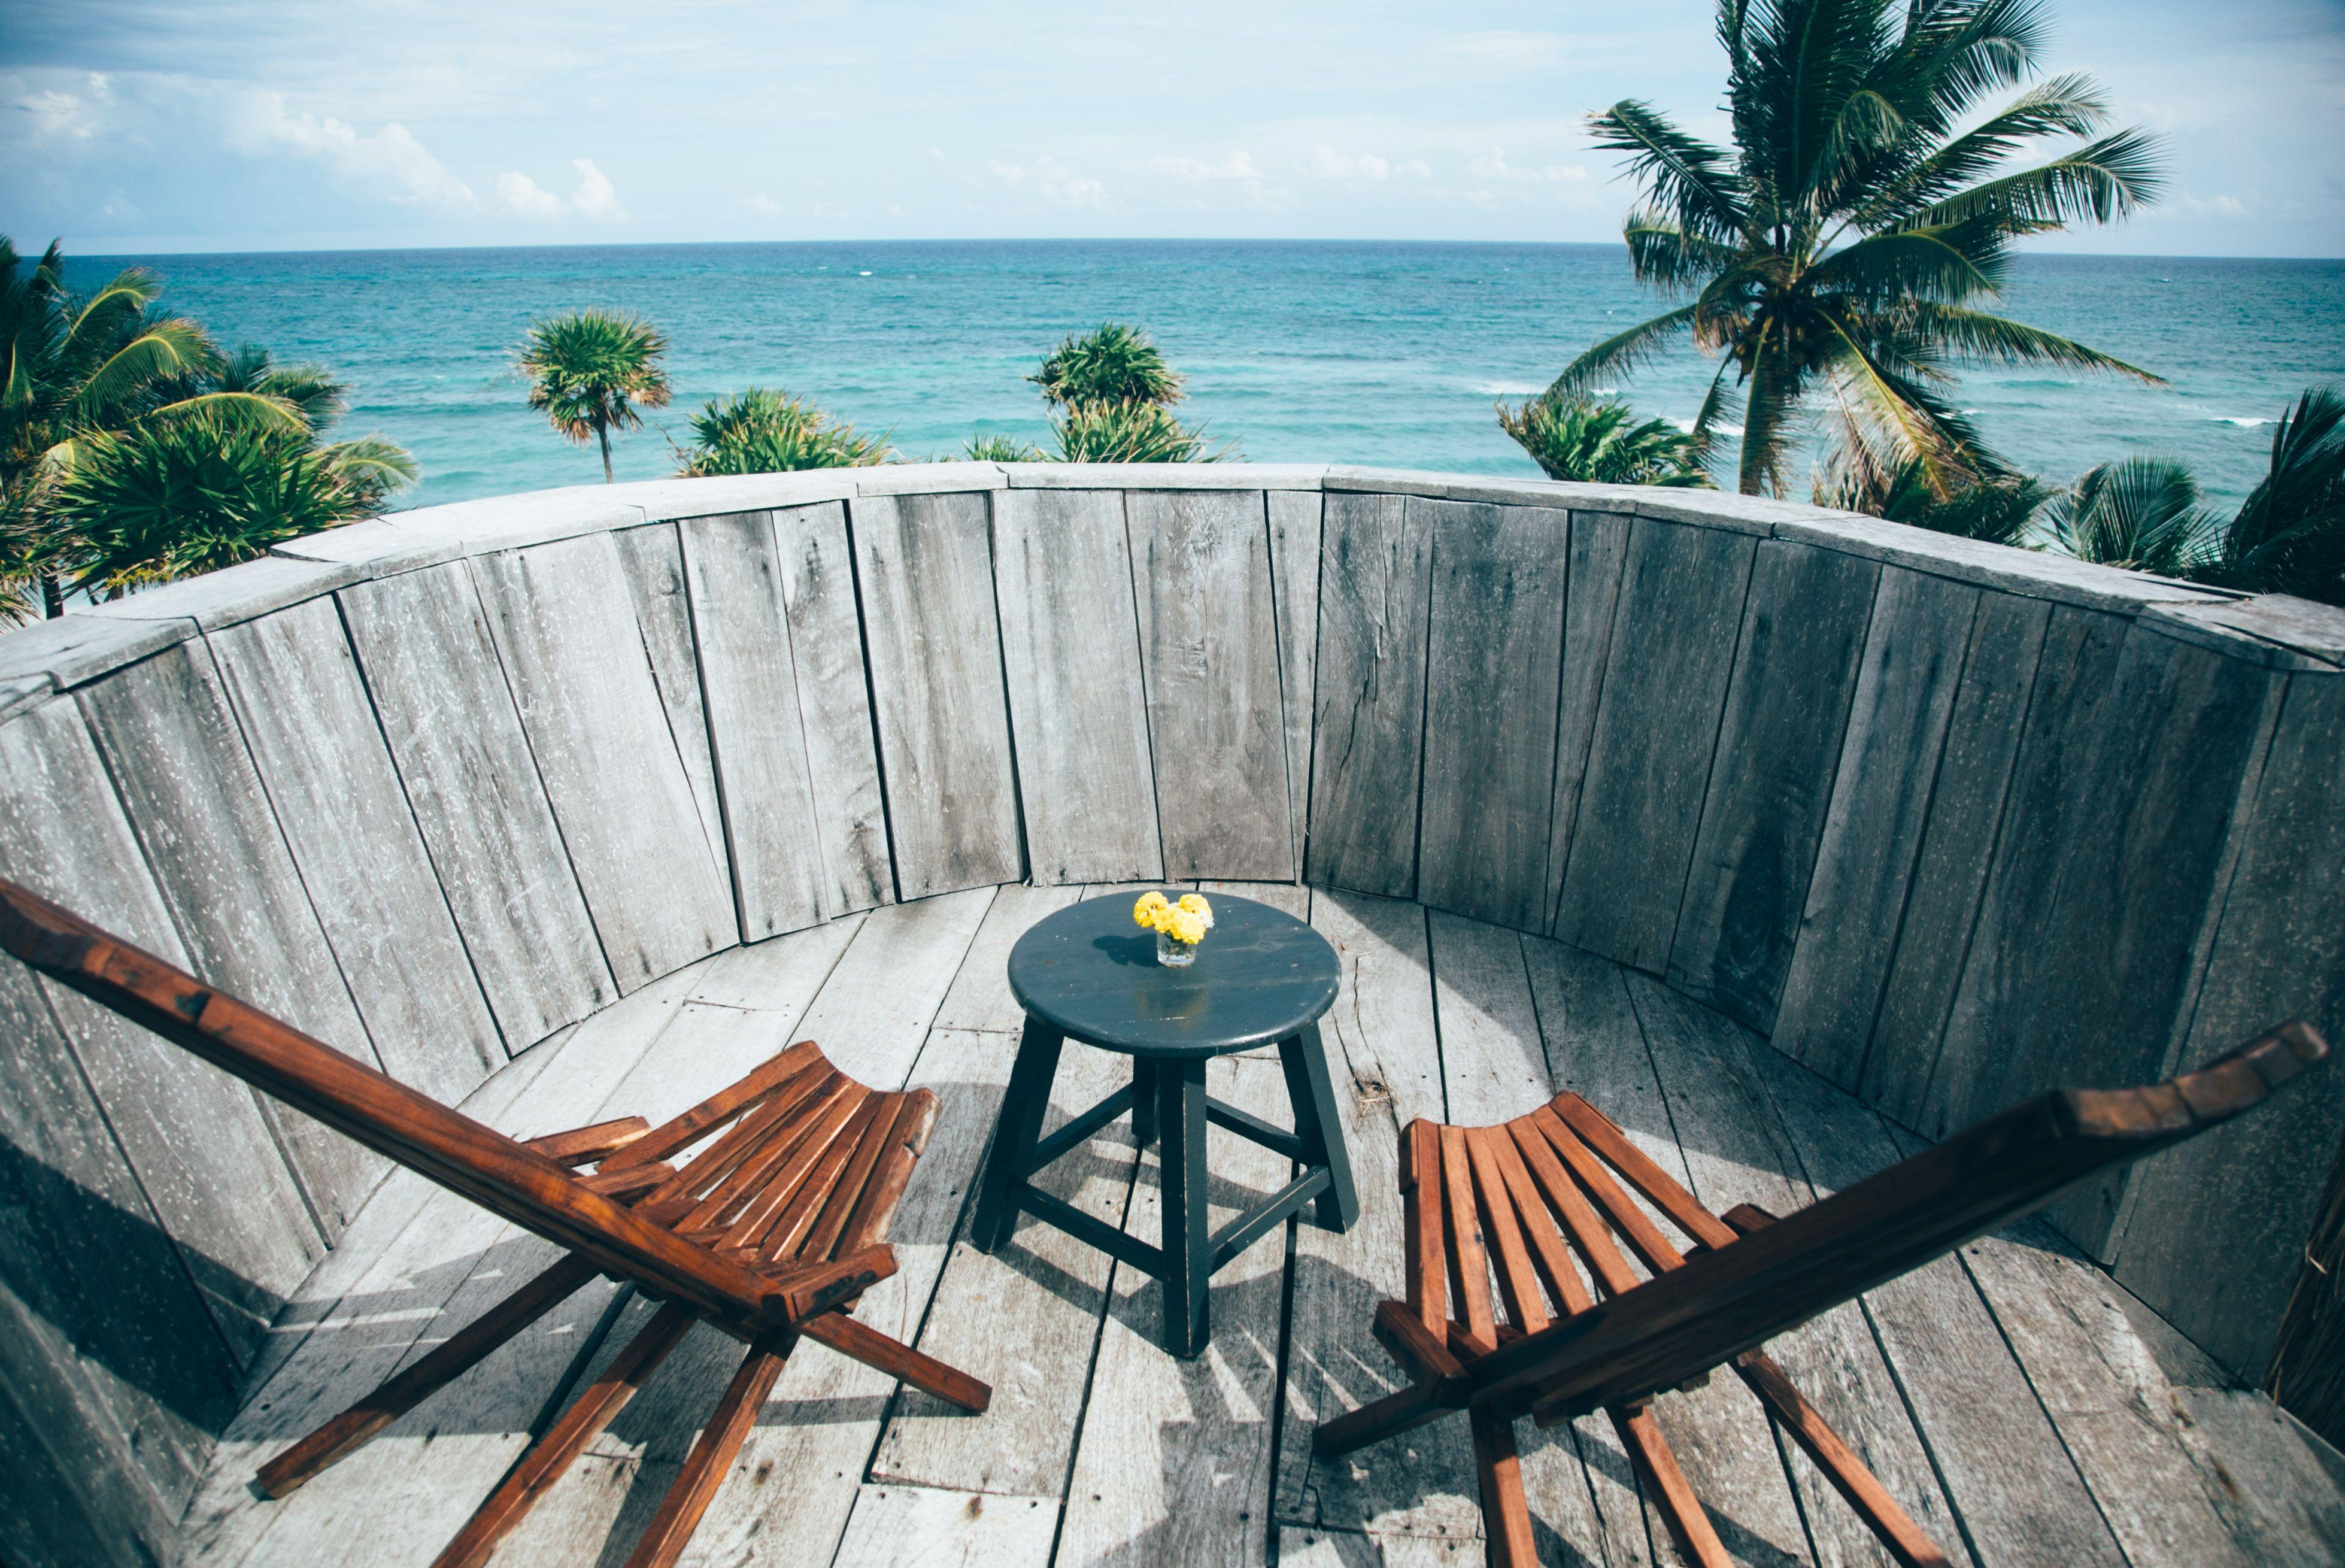 Roof top New Casita Papaya Playa, Tulum Mexico | Beach Life ...